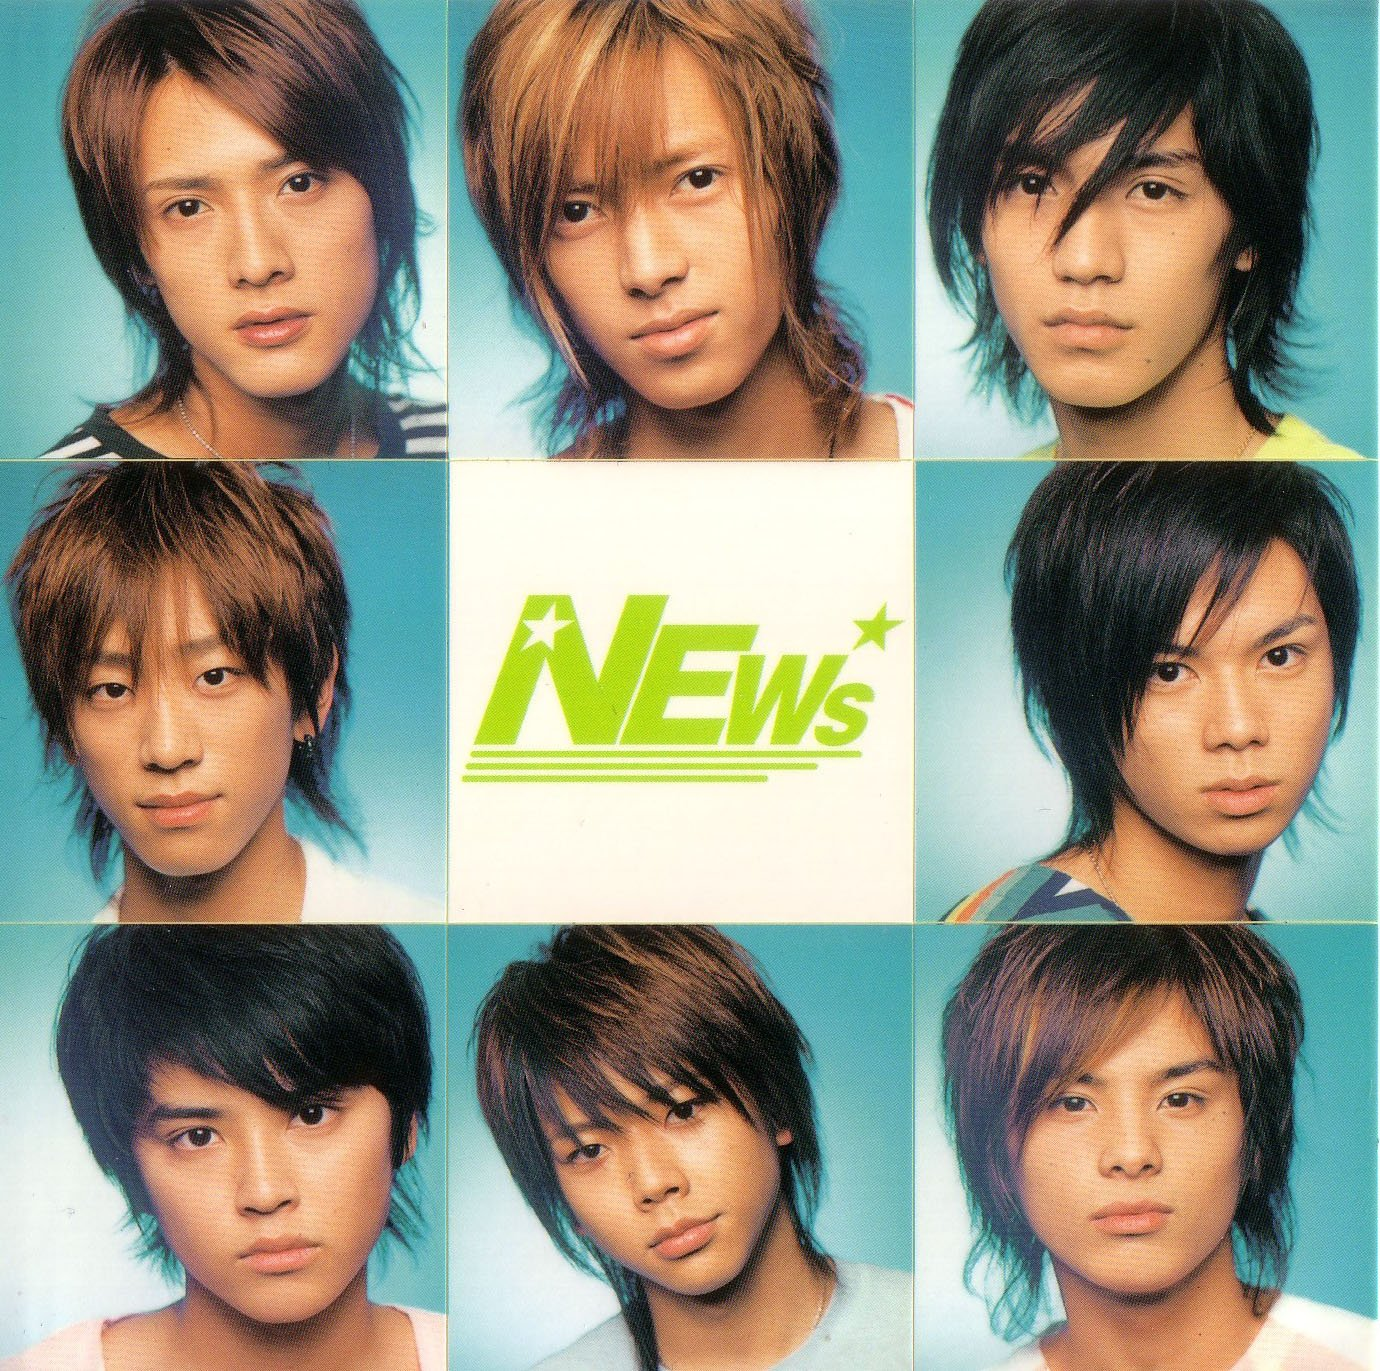 NEWS(にゅーす)初期メンバーの現在と活動 - Hachibachi